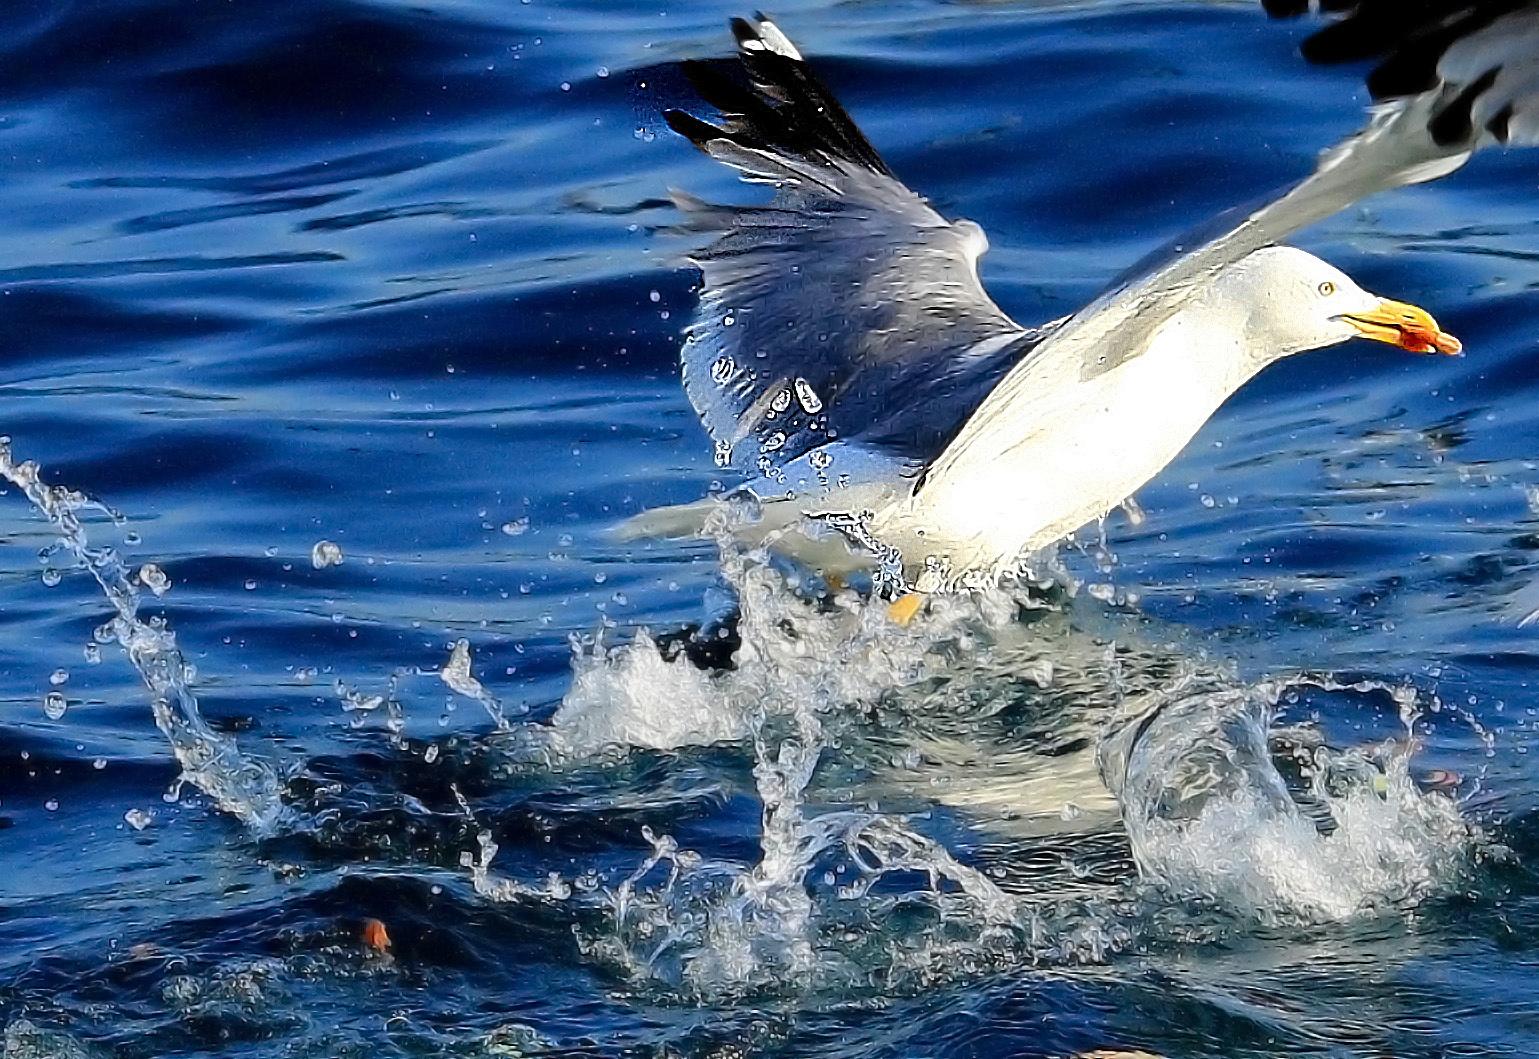 The Big Splash by Sumit Nandy